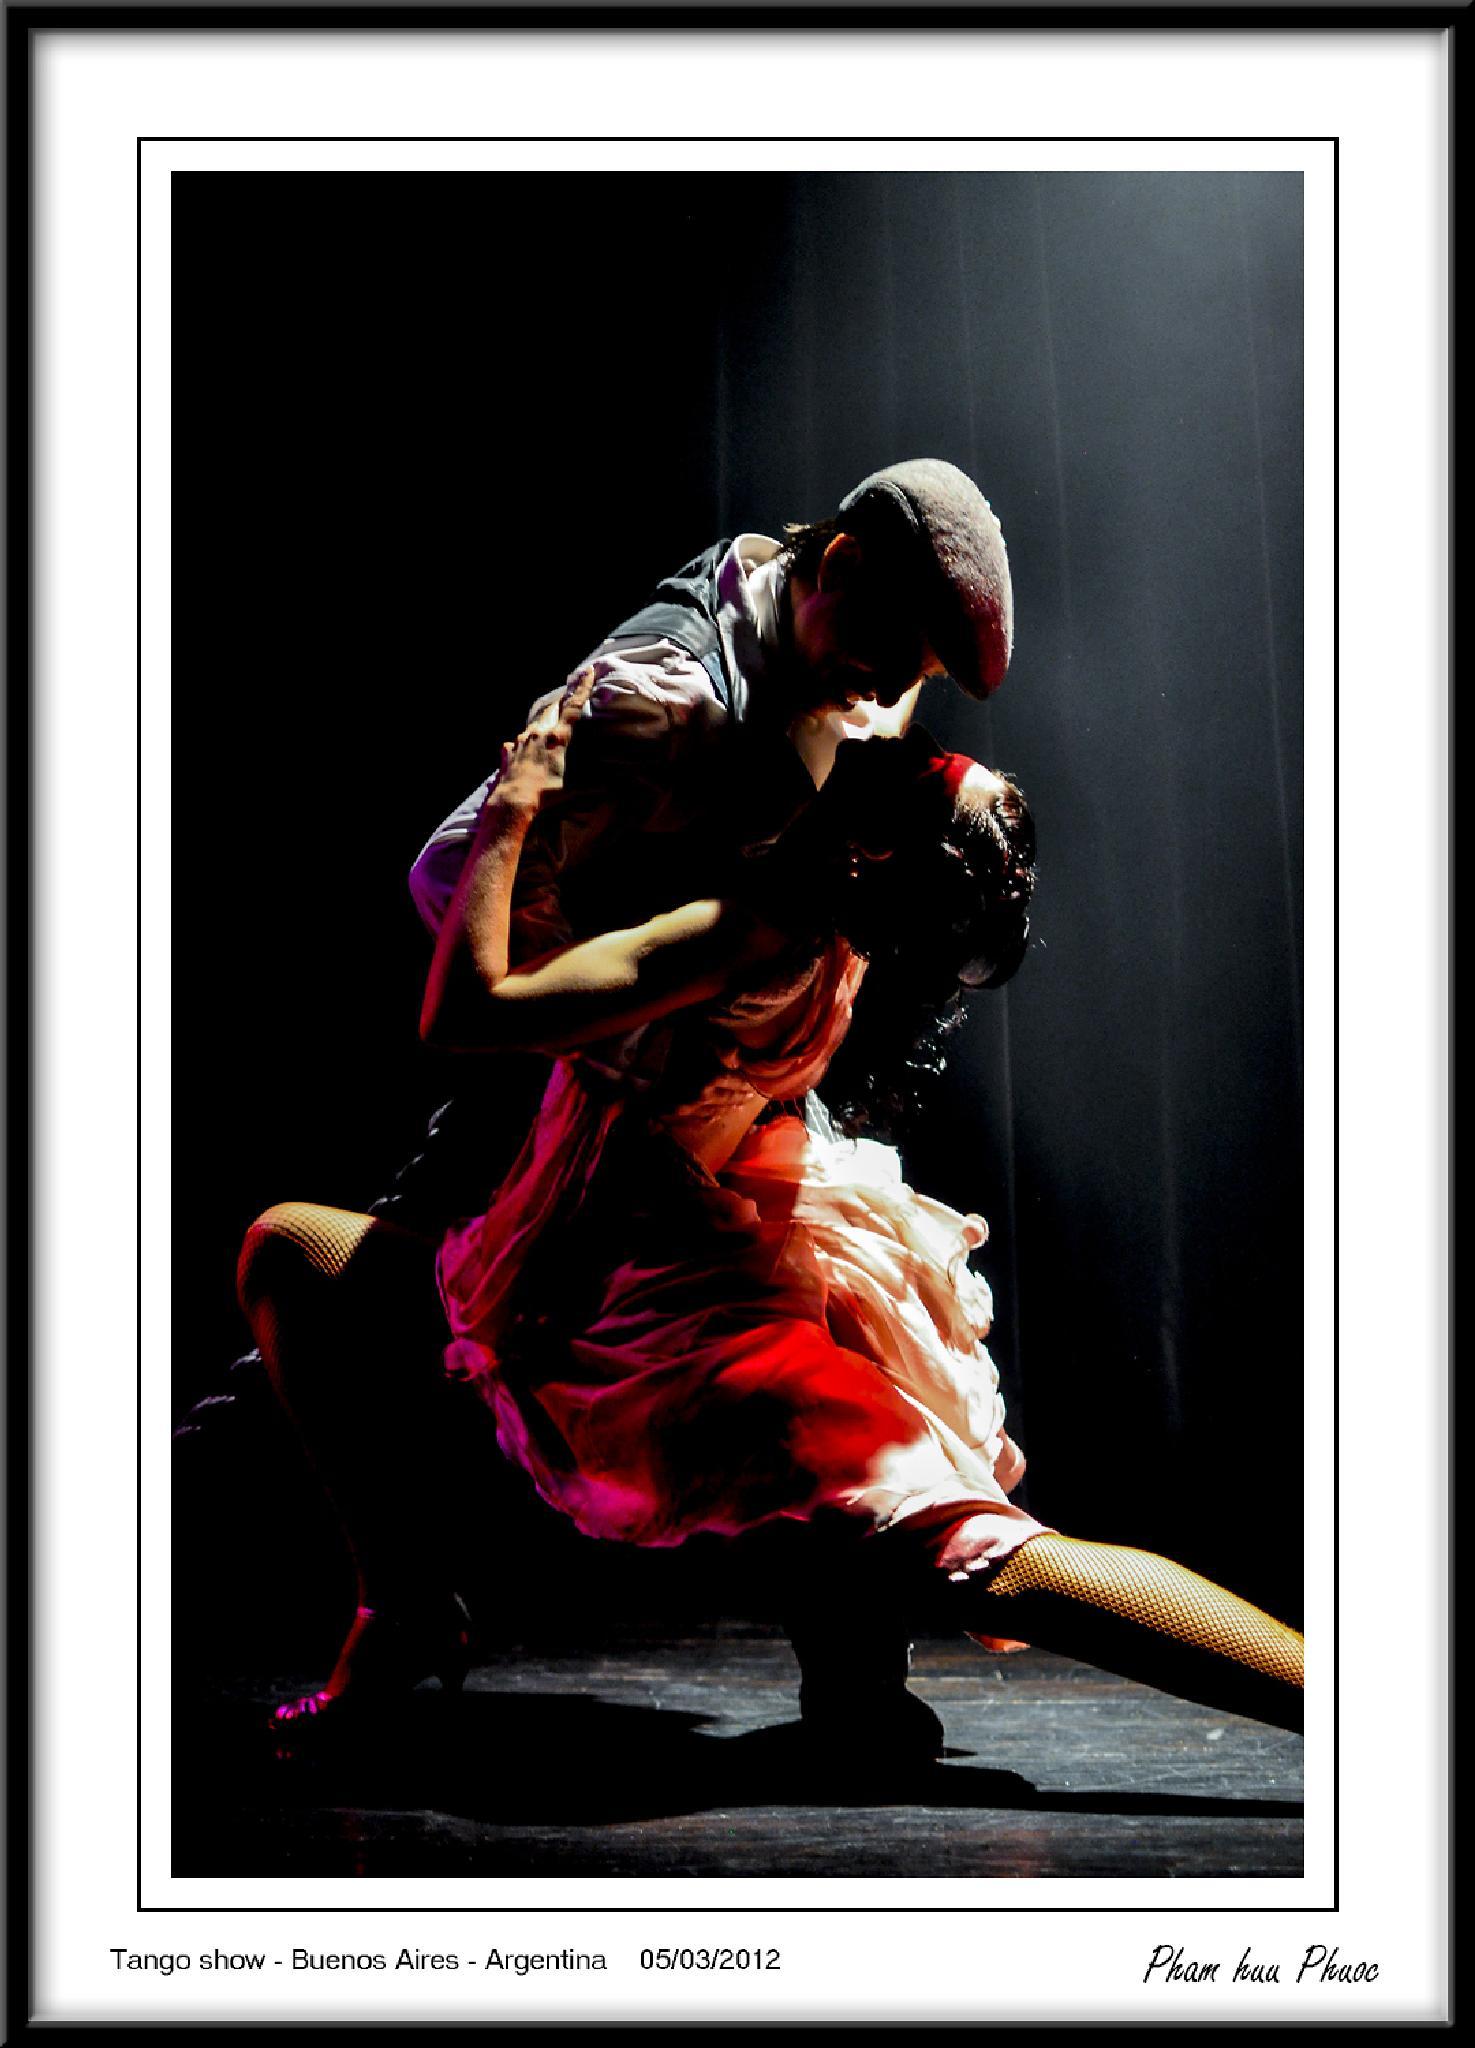 Tango show, Buenos Aires, Argentina by Huu Phuoc Pham